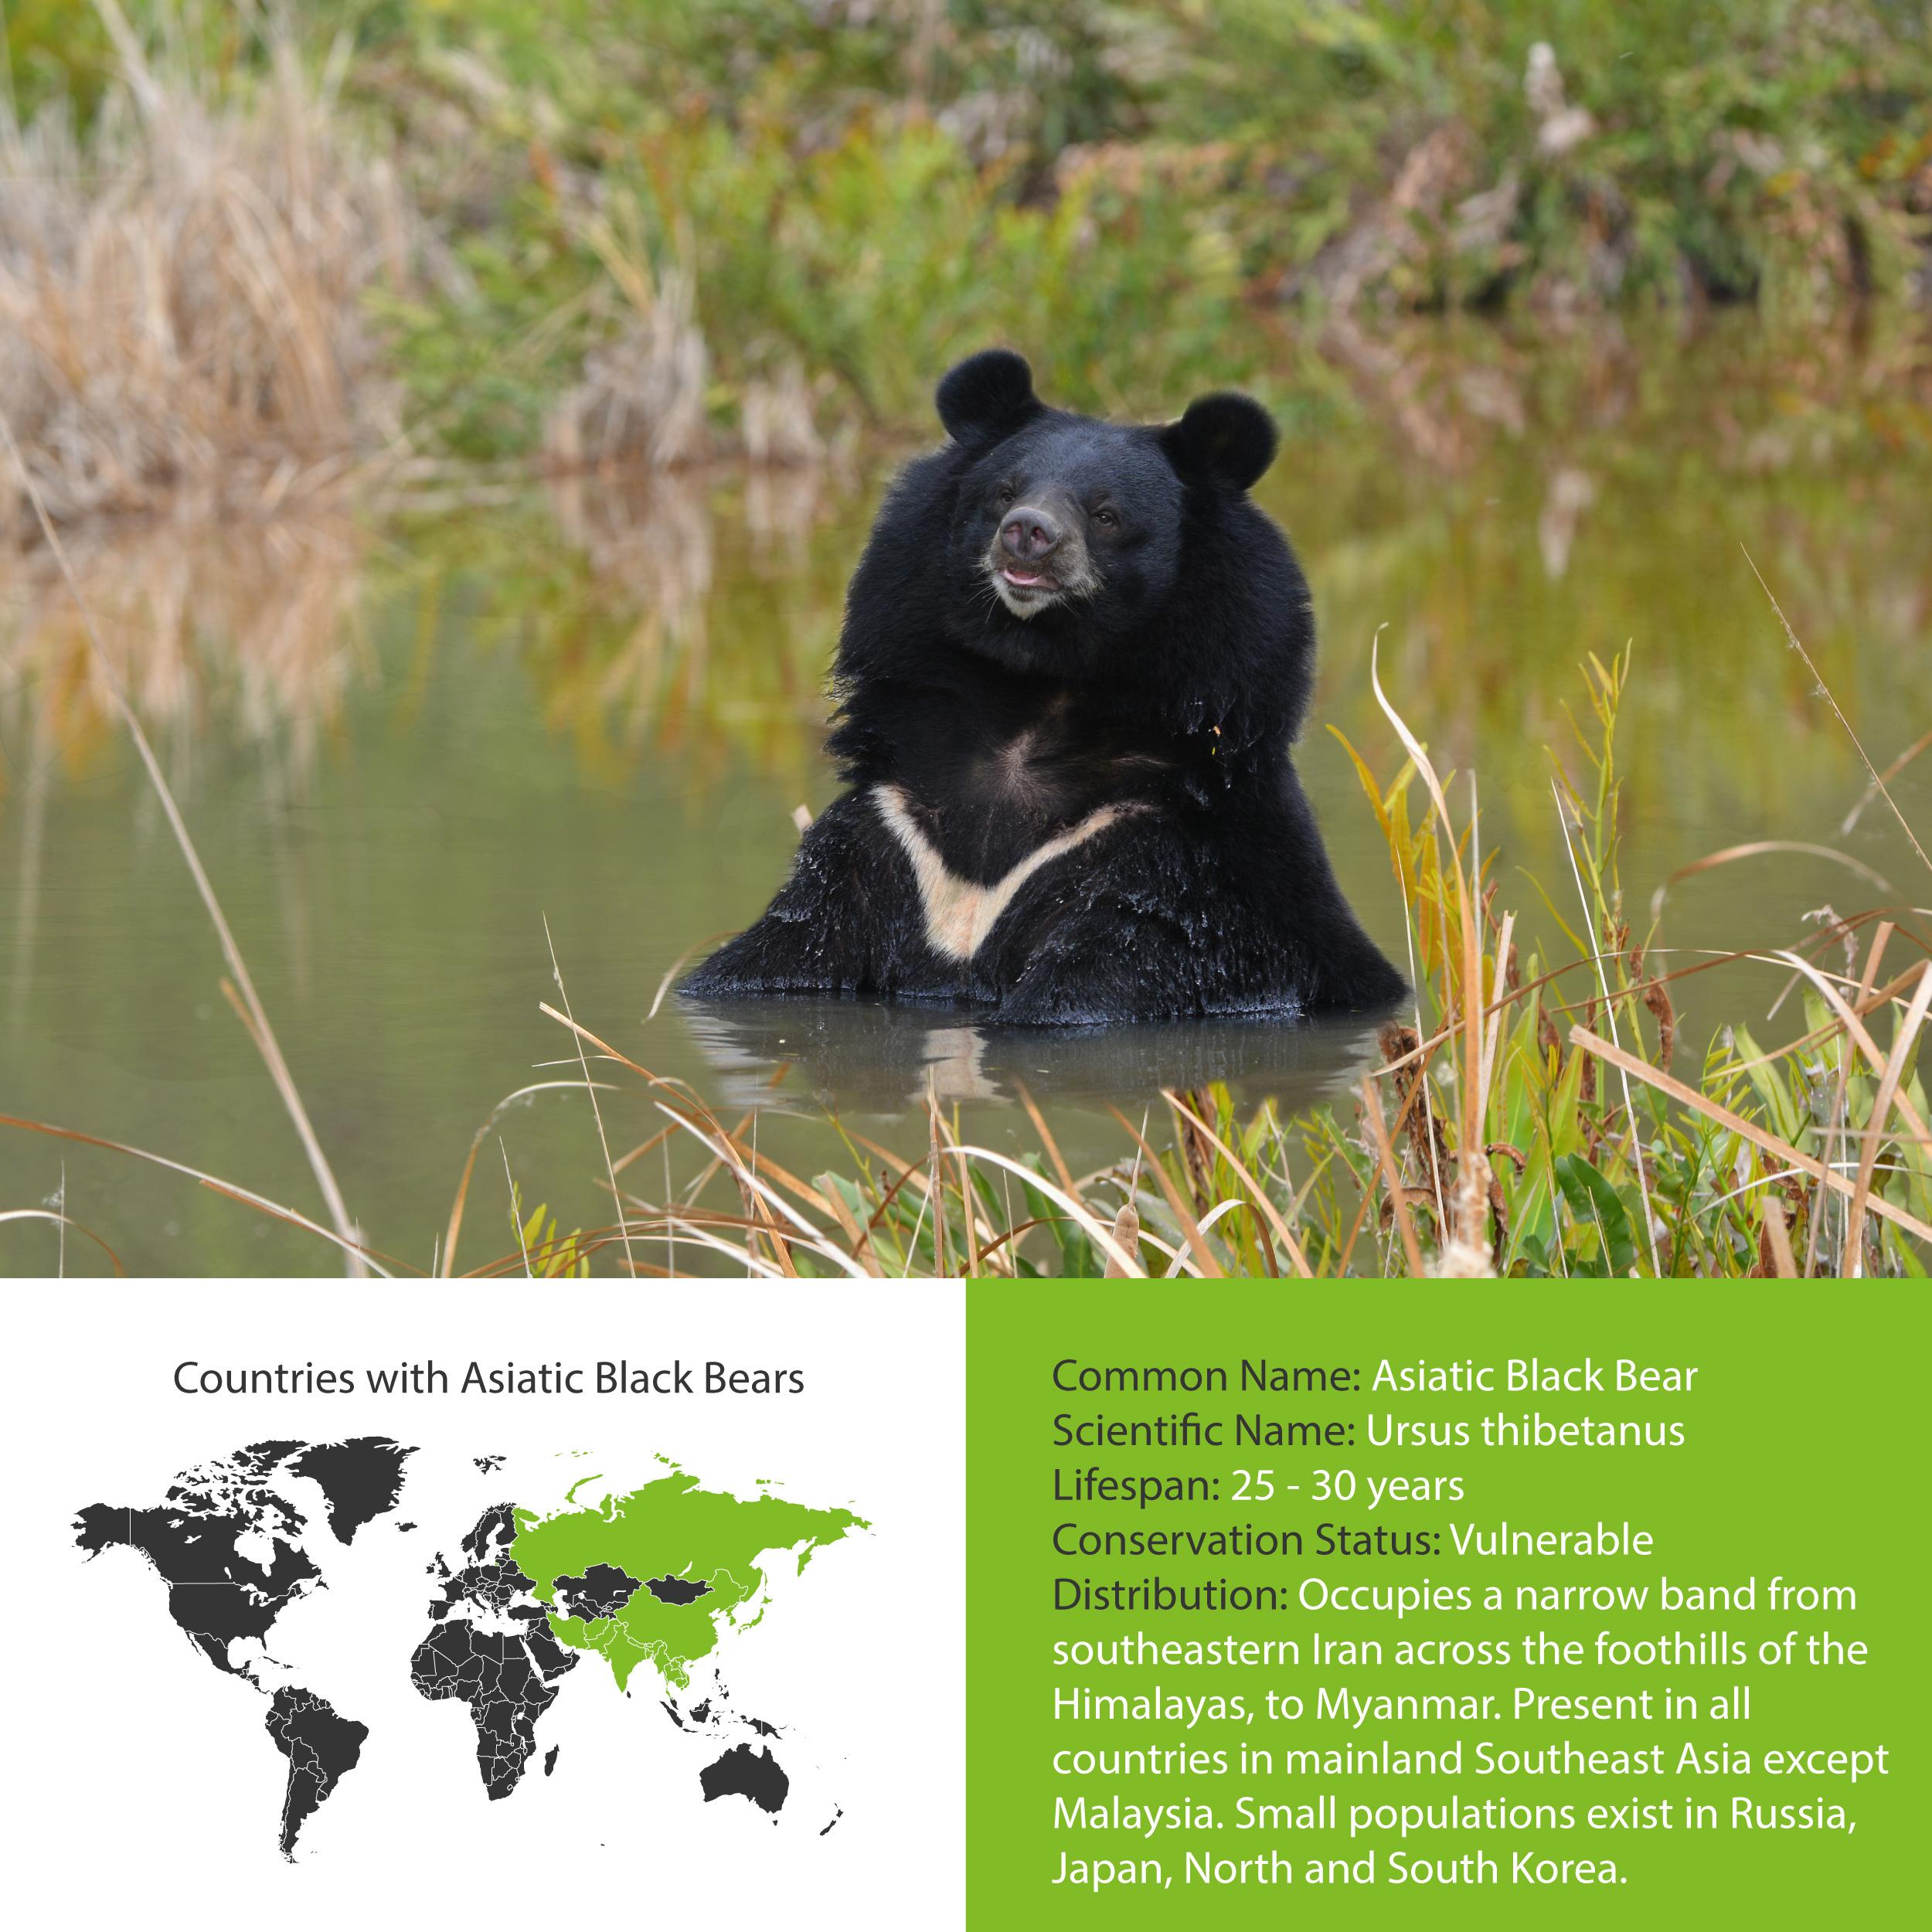 Asiatic Black Bear Distribution